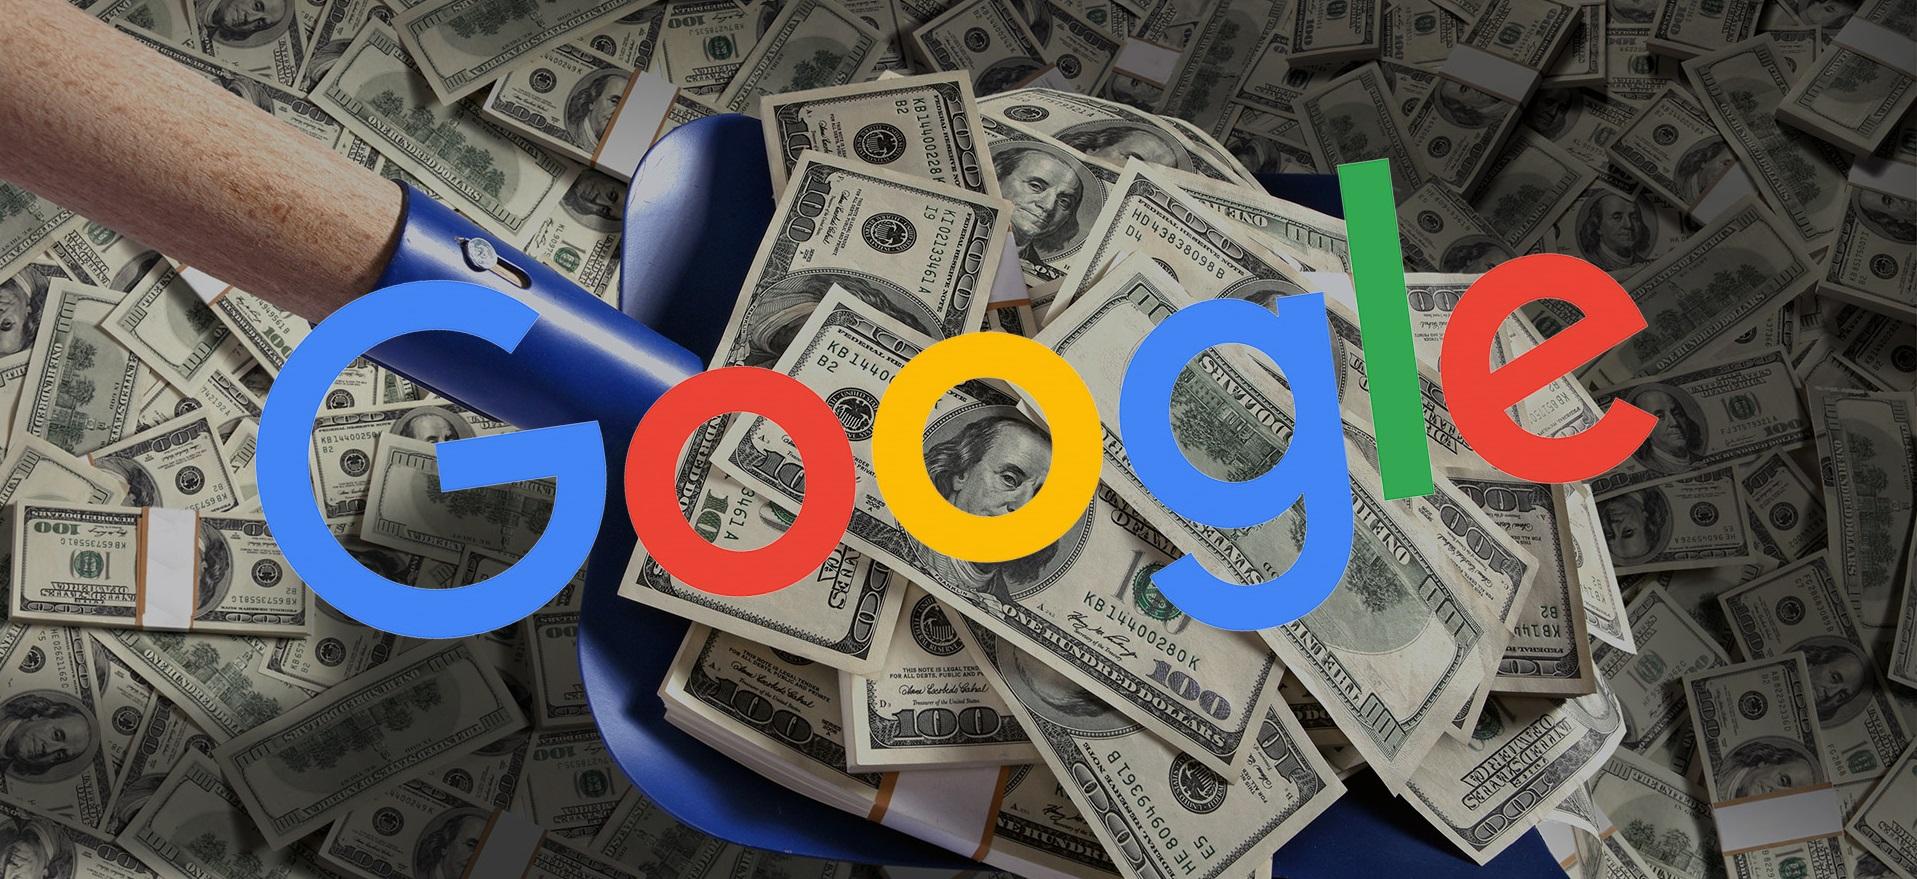 La UE multaría a Google con 3.000M de euros como castigo antimonopolio